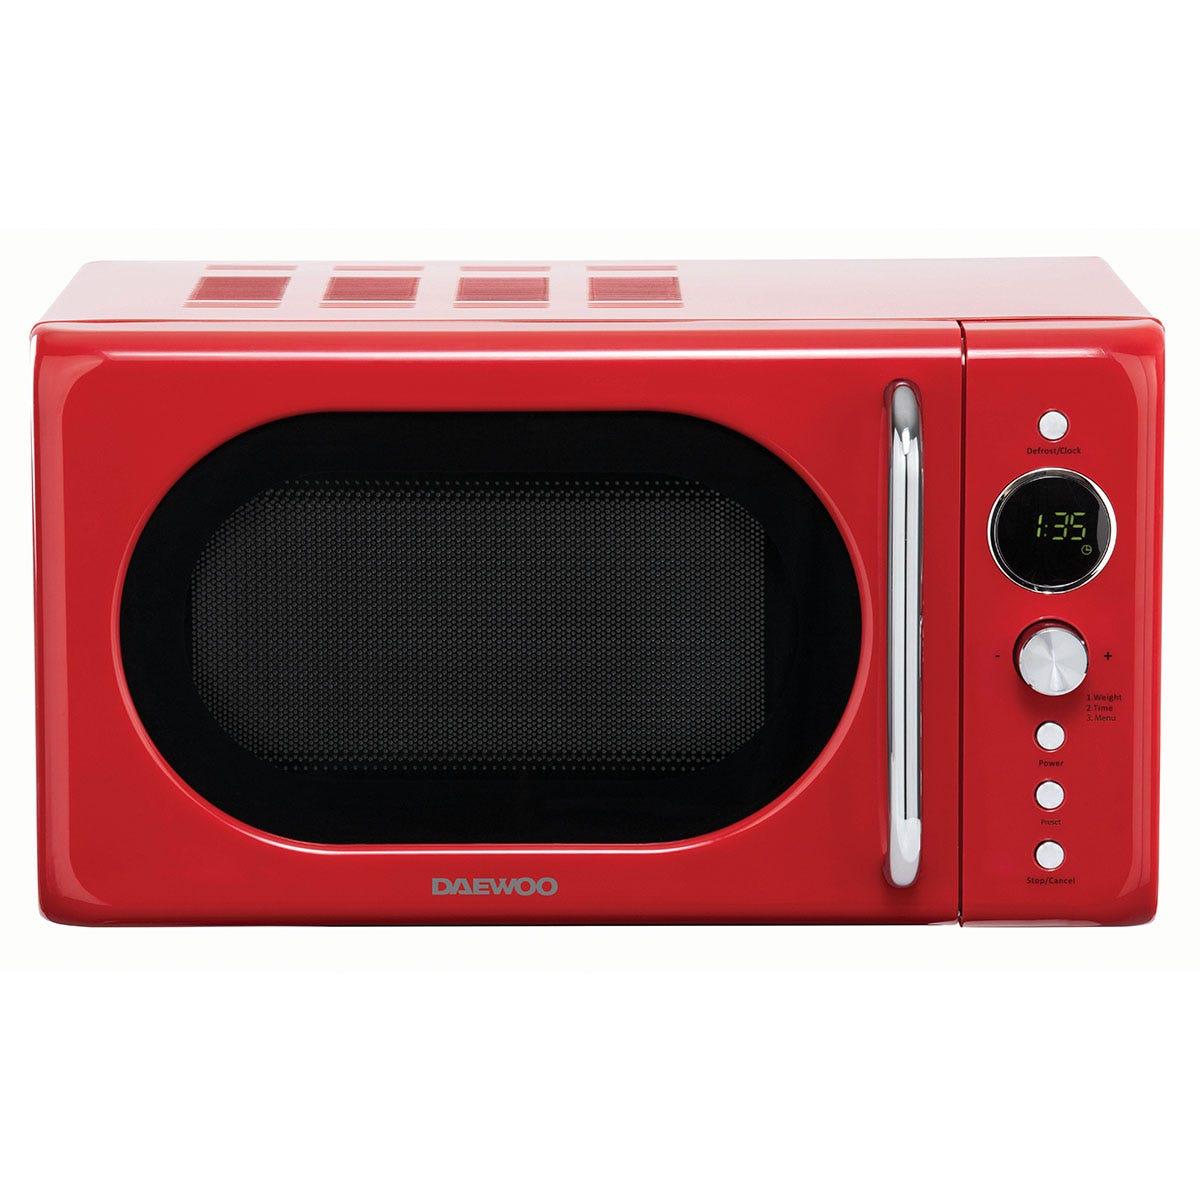 Daewoo SDA2086GE 20L 800W Manual Microwave - Red